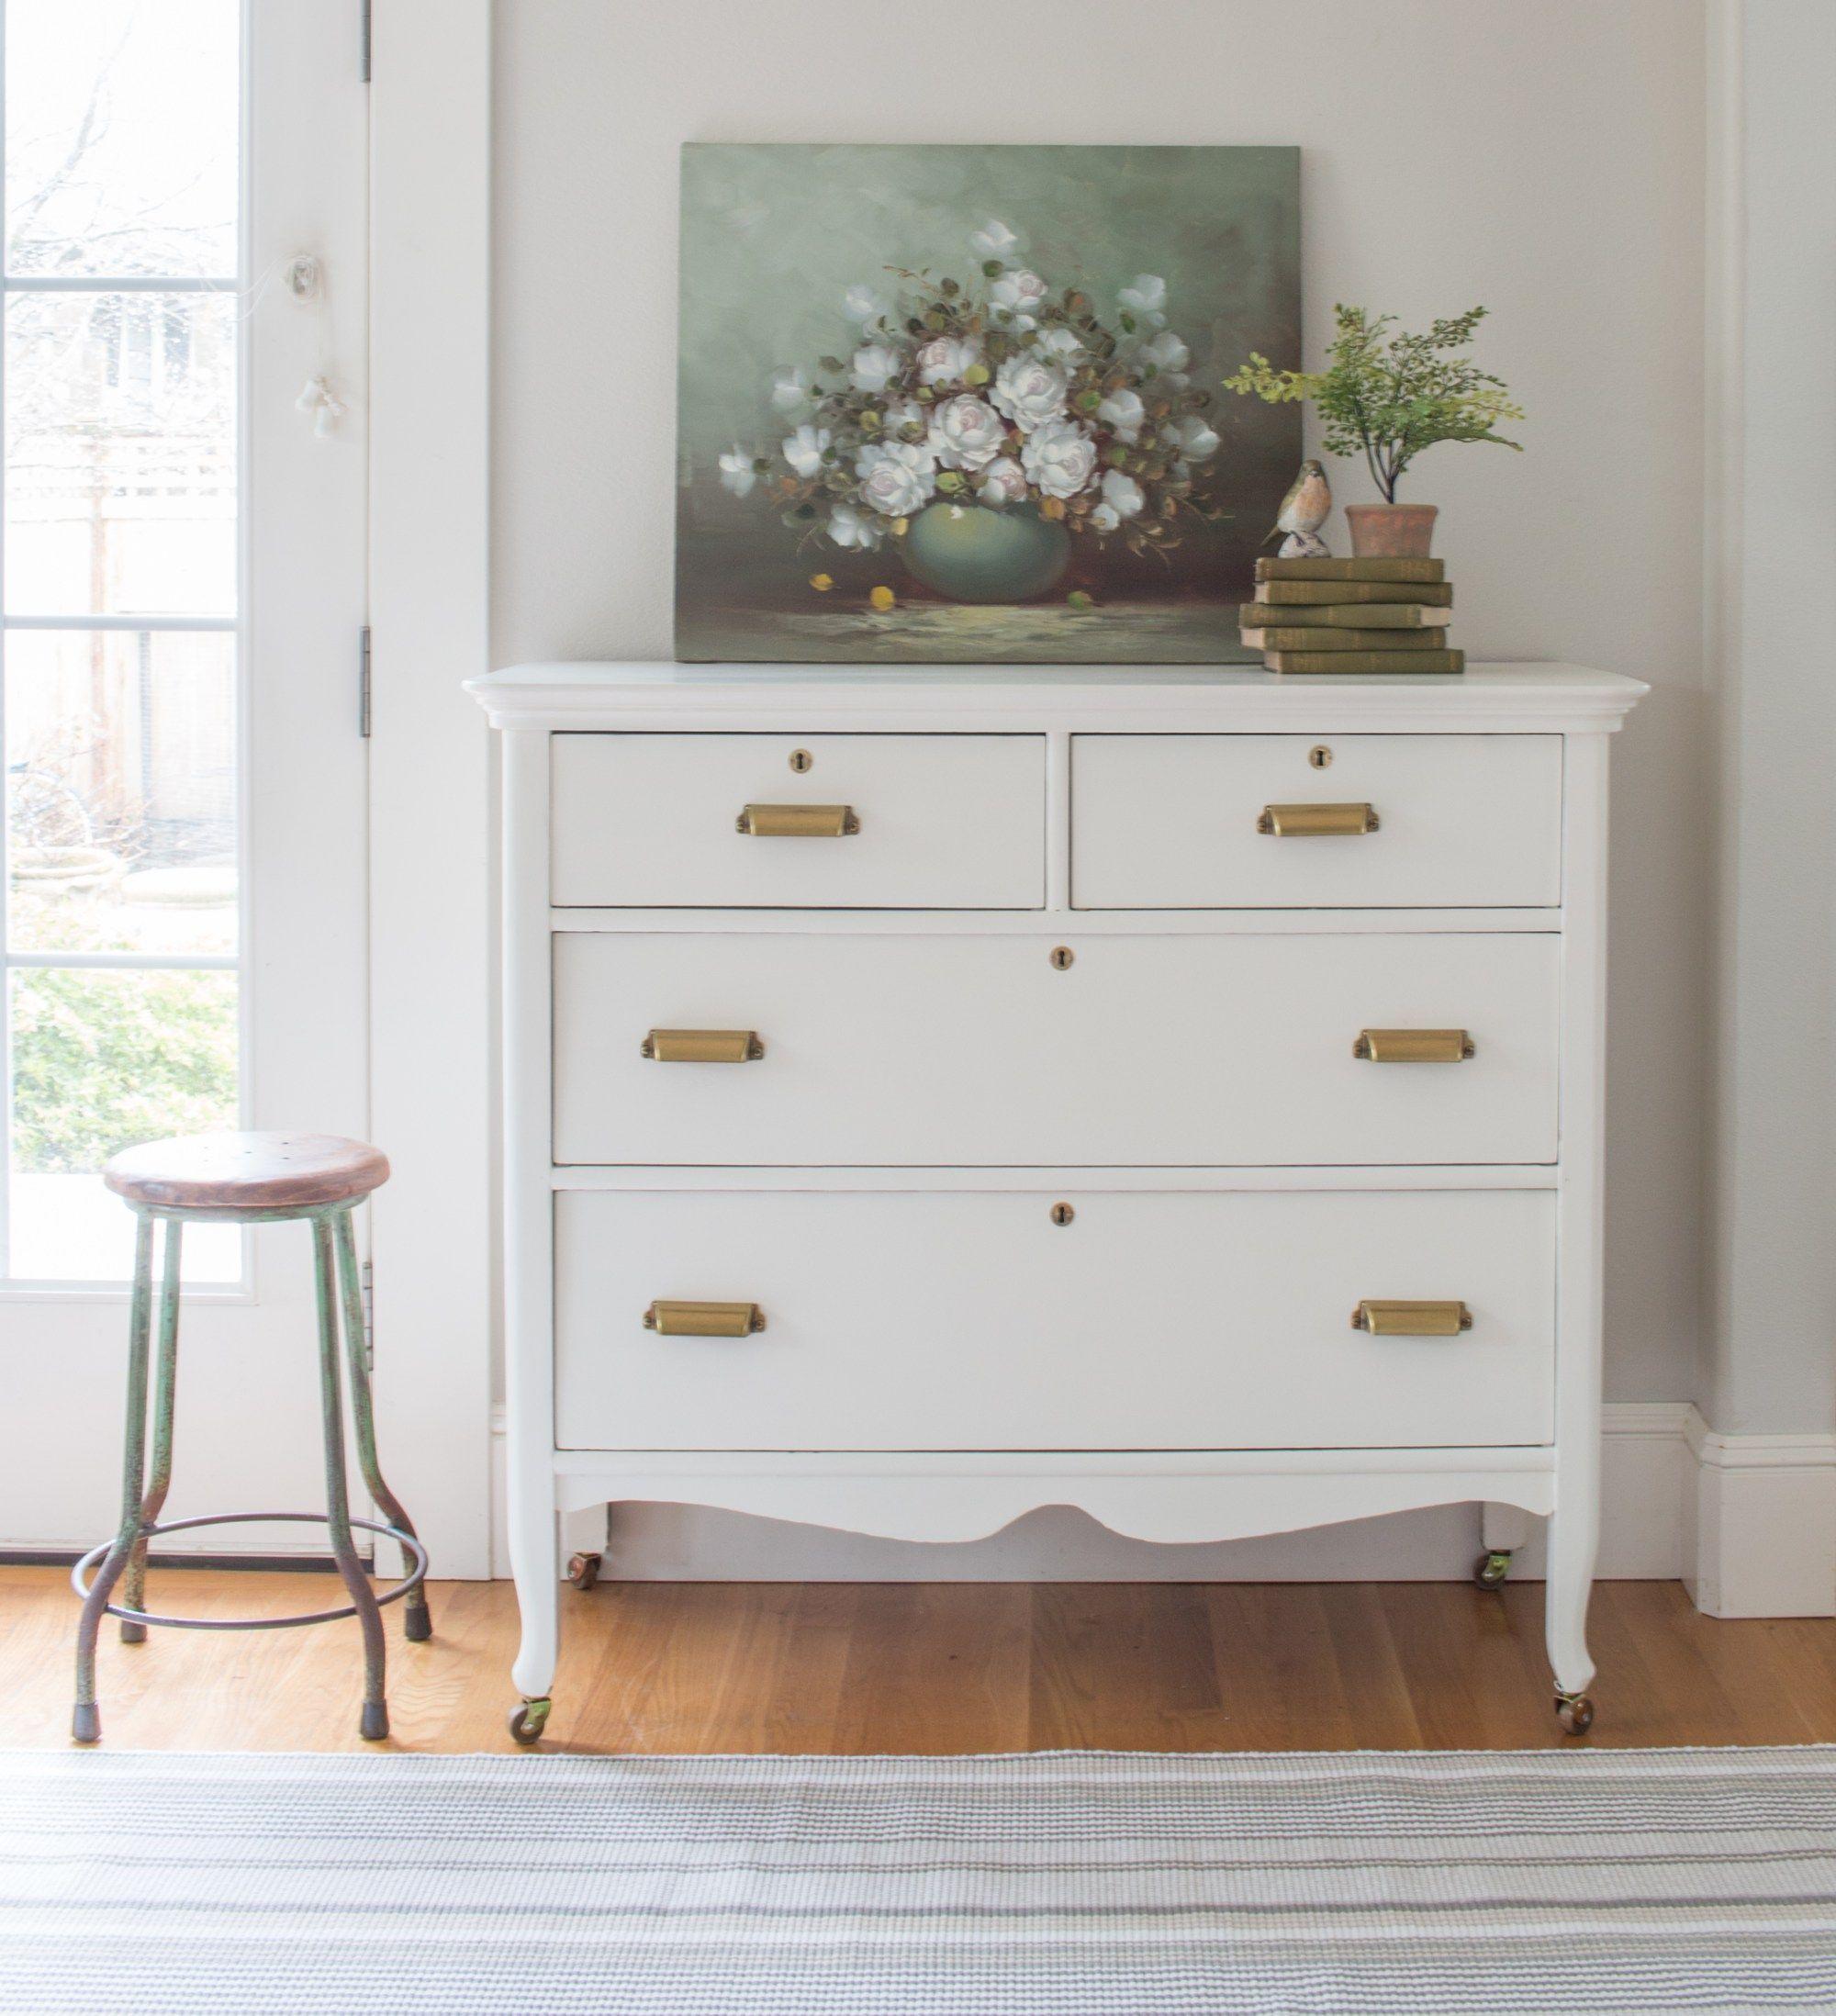 White And Brass Vintage Dresser Makeover Saw Nail And Paint Vintage Dresser Makeover Dresser Decor Dressers Makeover [ 2196 x 2000 Pixel ]